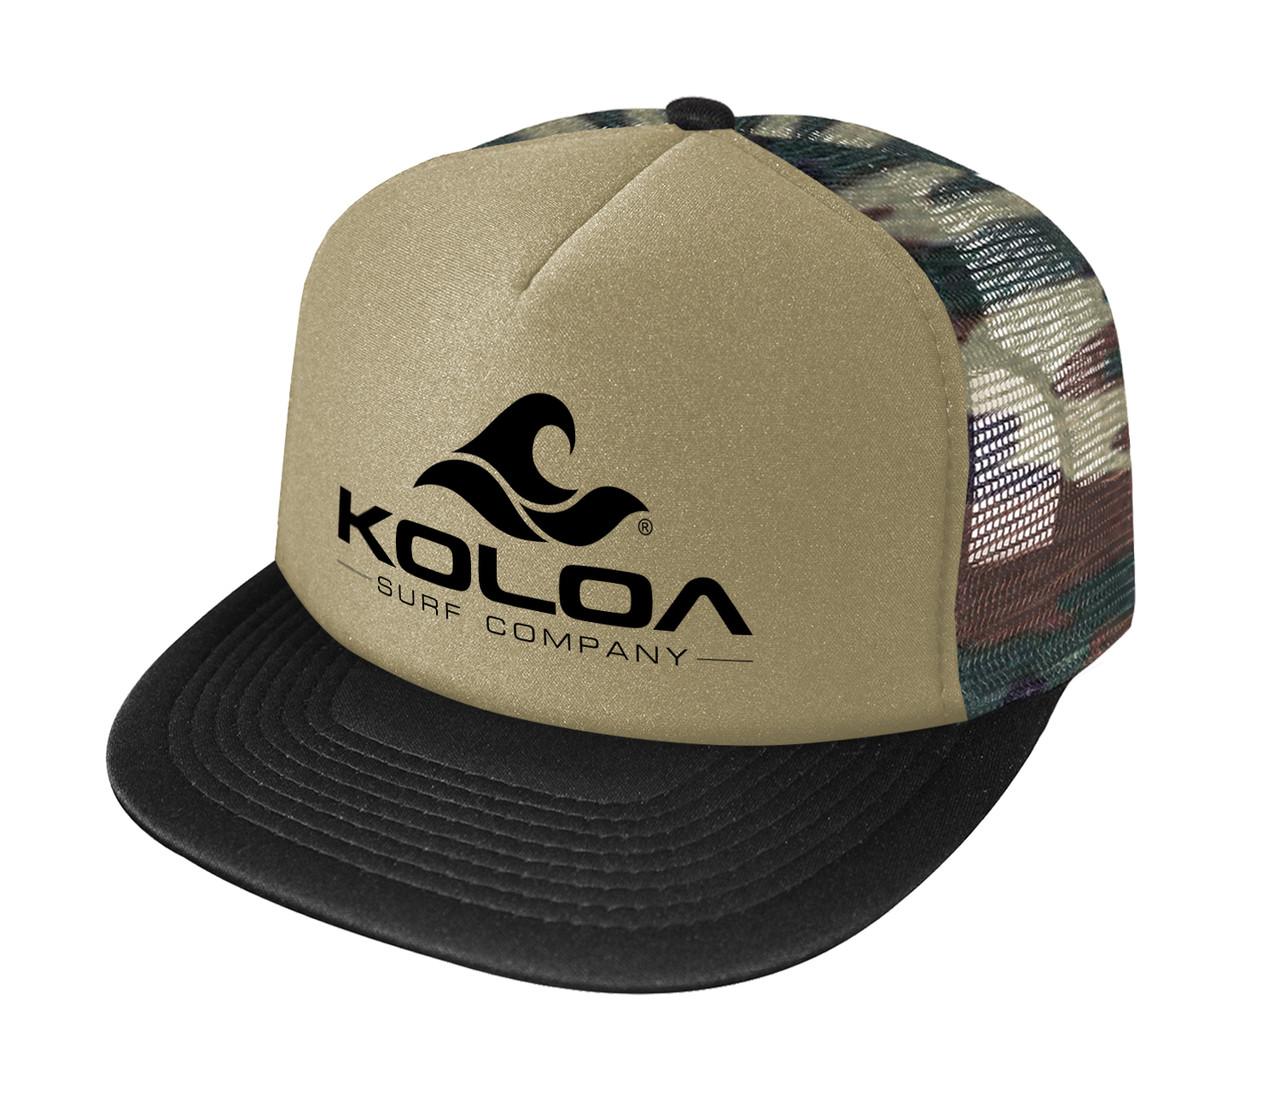 Koloa Surf Co. Wave Logo Poly-Foam Mesh Snapback High Profile ... 17c2dd8a7bac